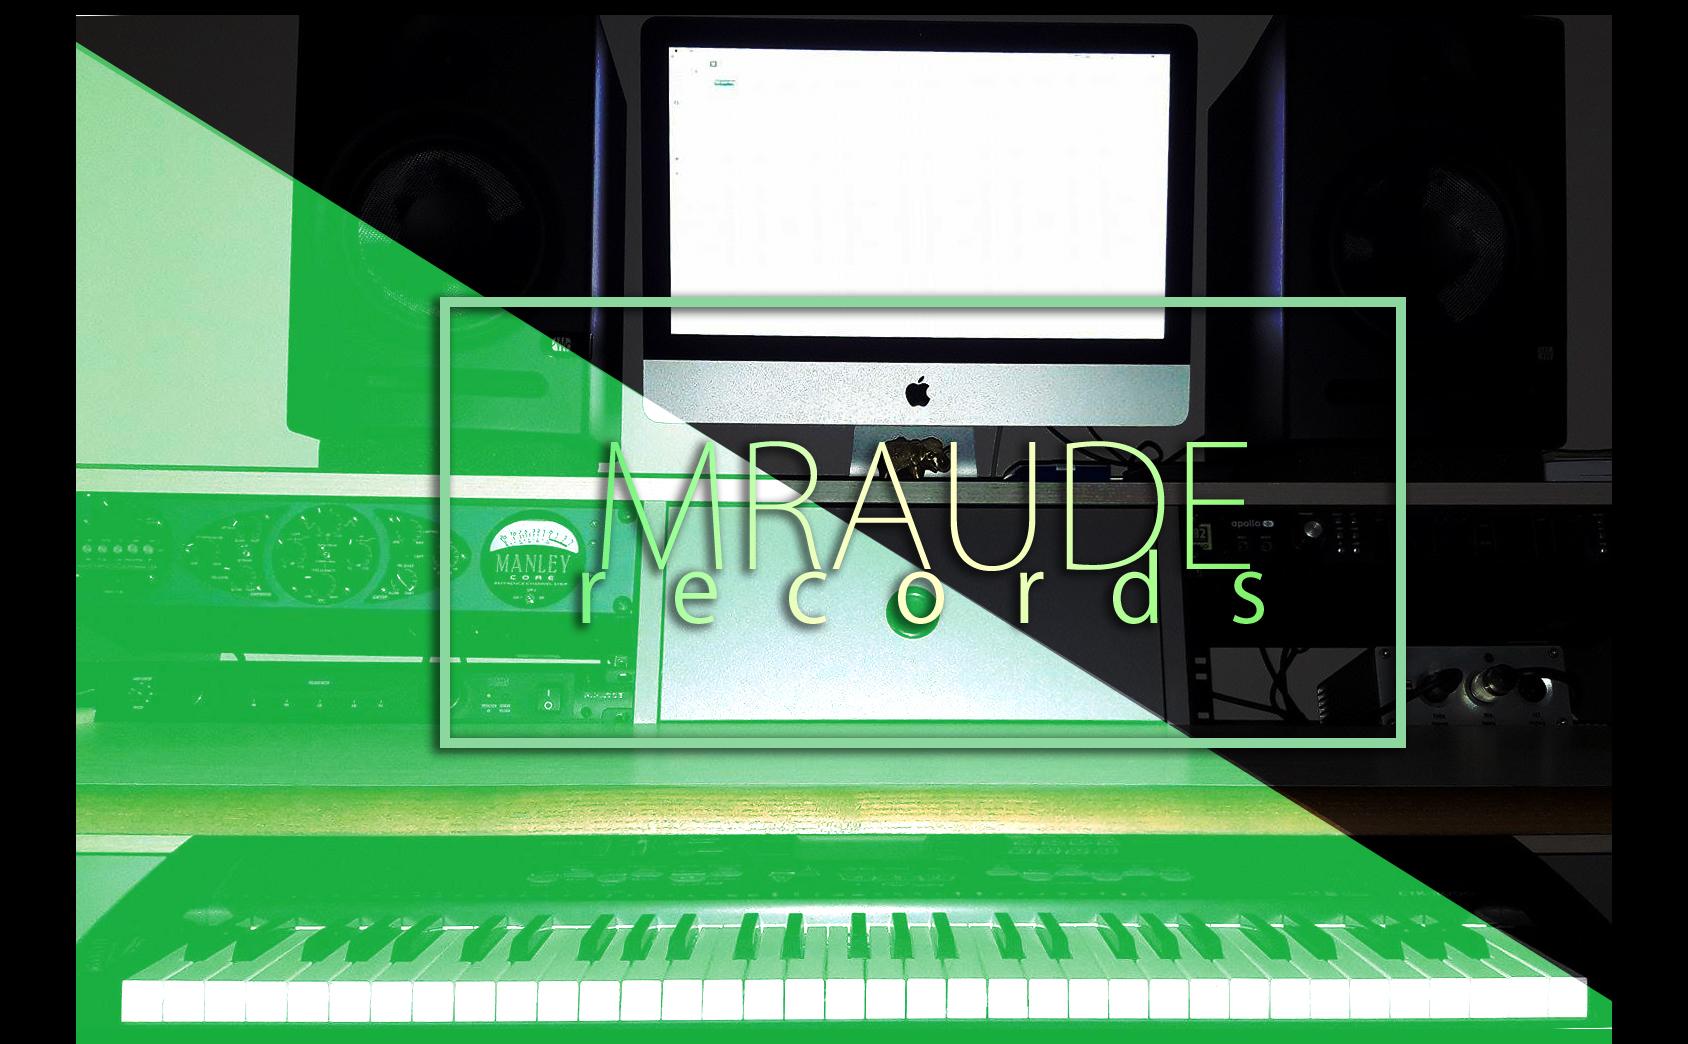 Mraude_records